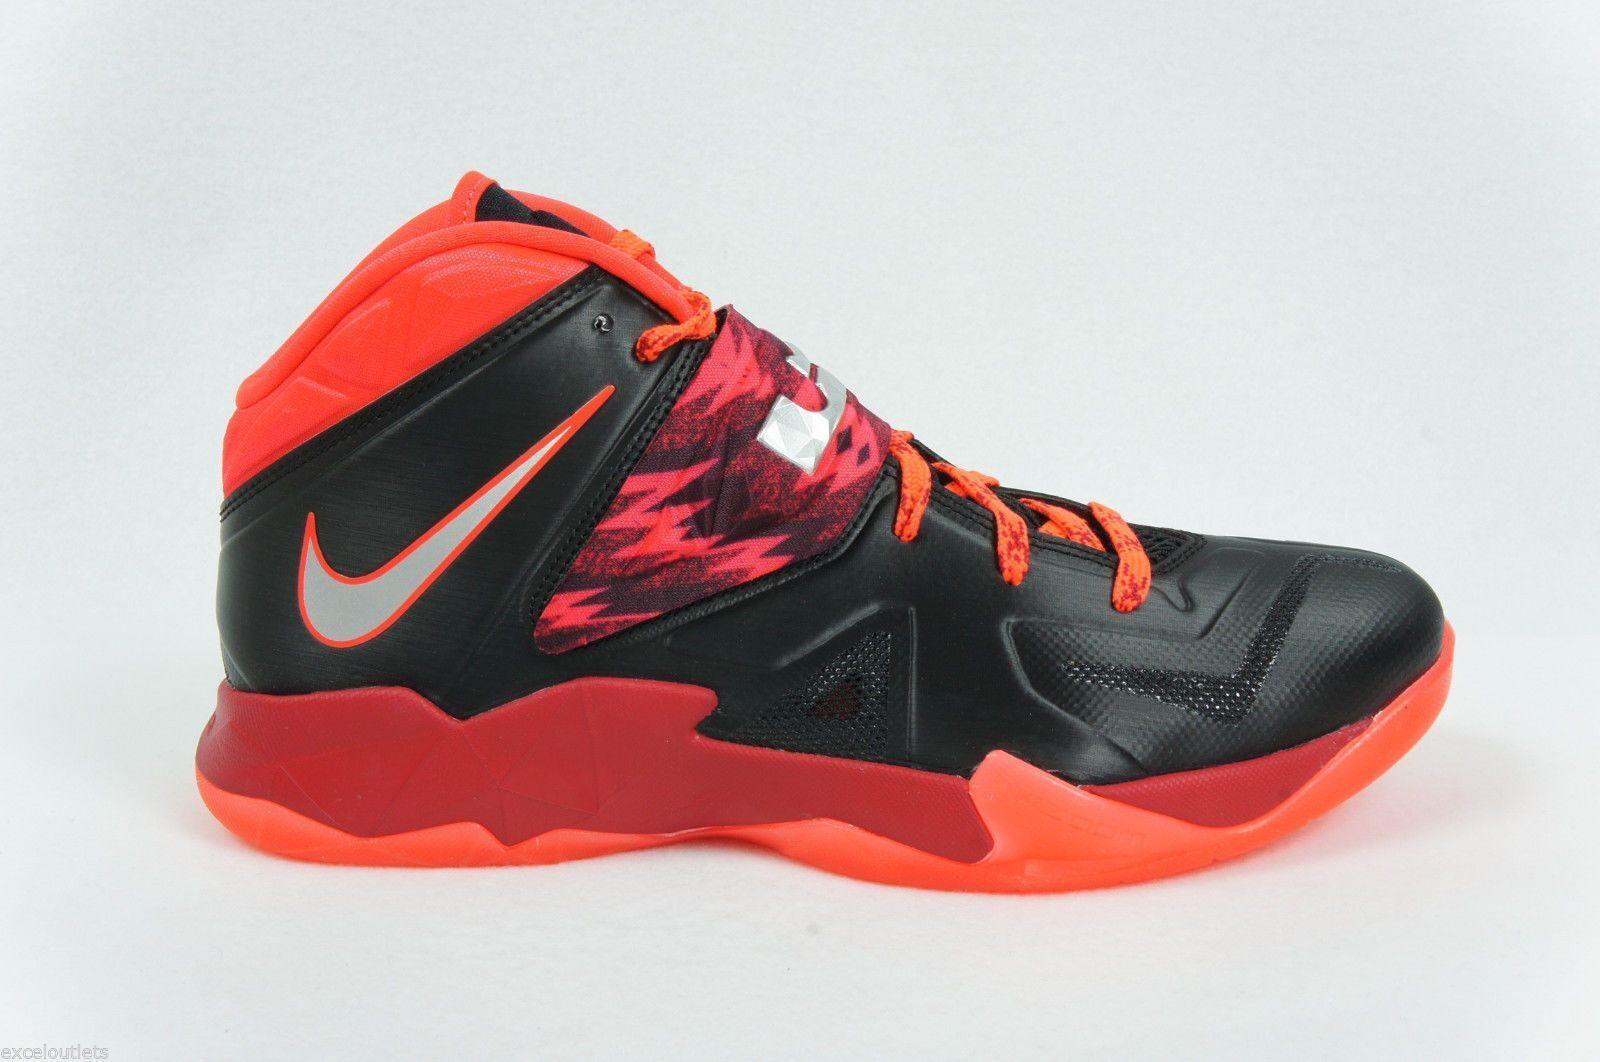 Nike Zoom Soldier VII pp 7 LeBron 609679-005 James zapatos de baloncesto 609679-005 LeBron hombre sz 12 c5b8ba